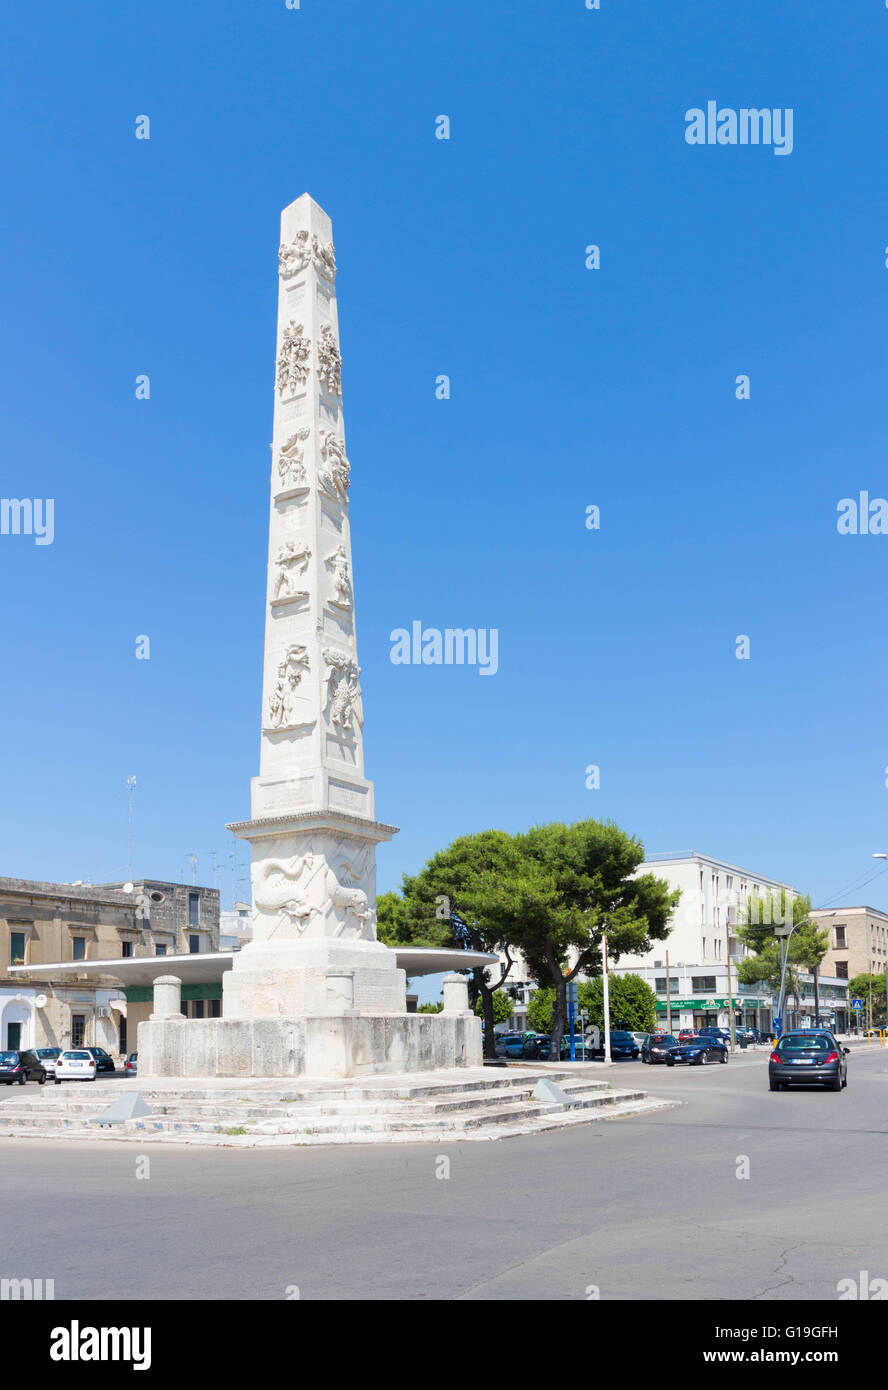 The white obelisk in Lecce - Stock Image